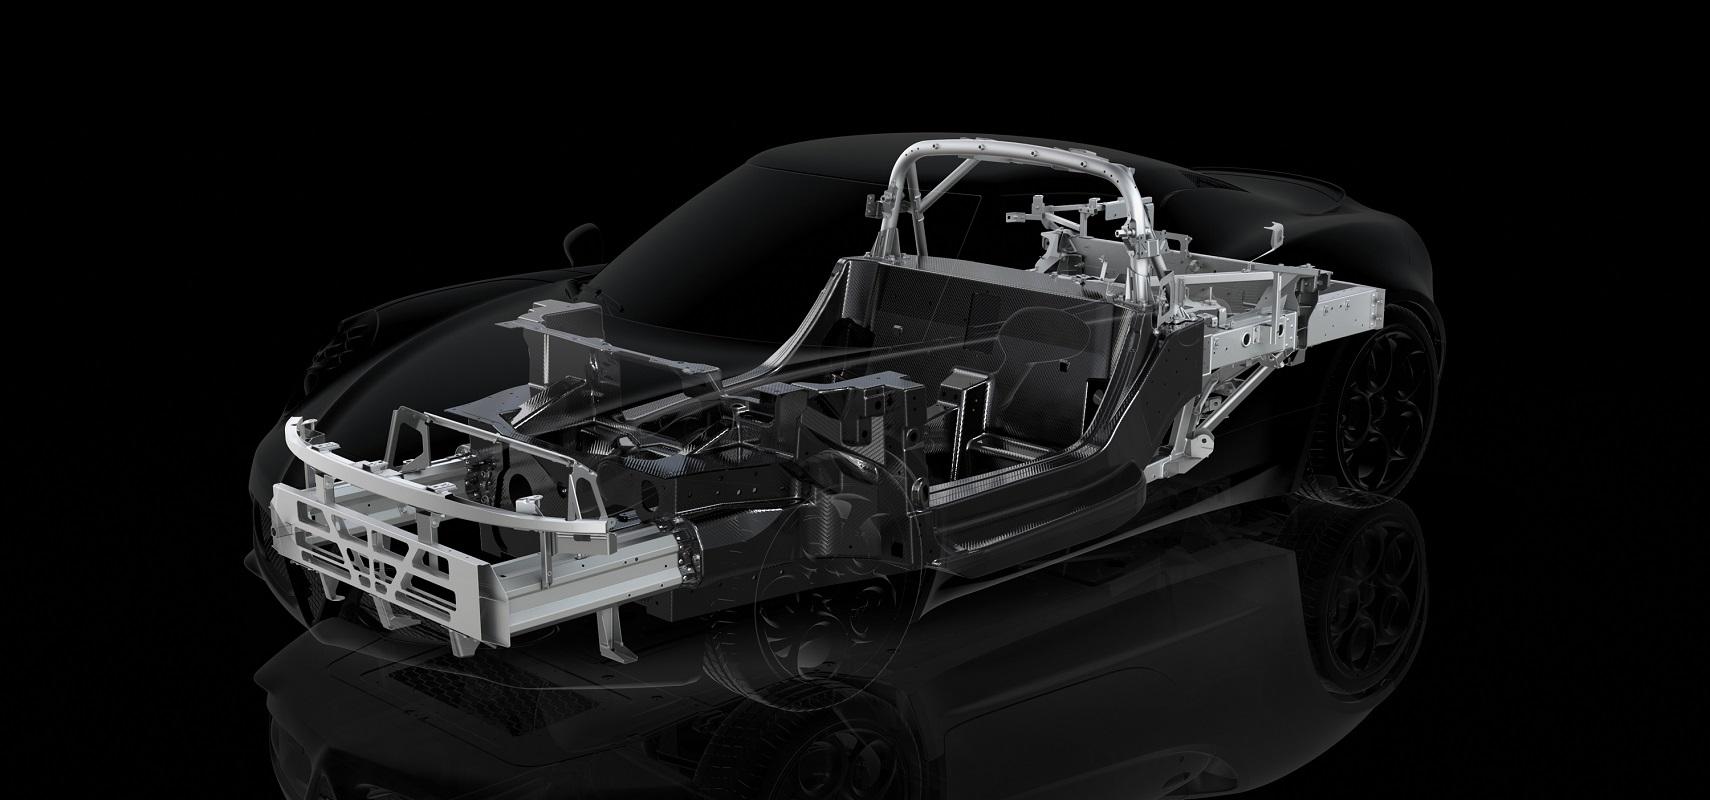 Alfa Romeo 4C lightweight structure